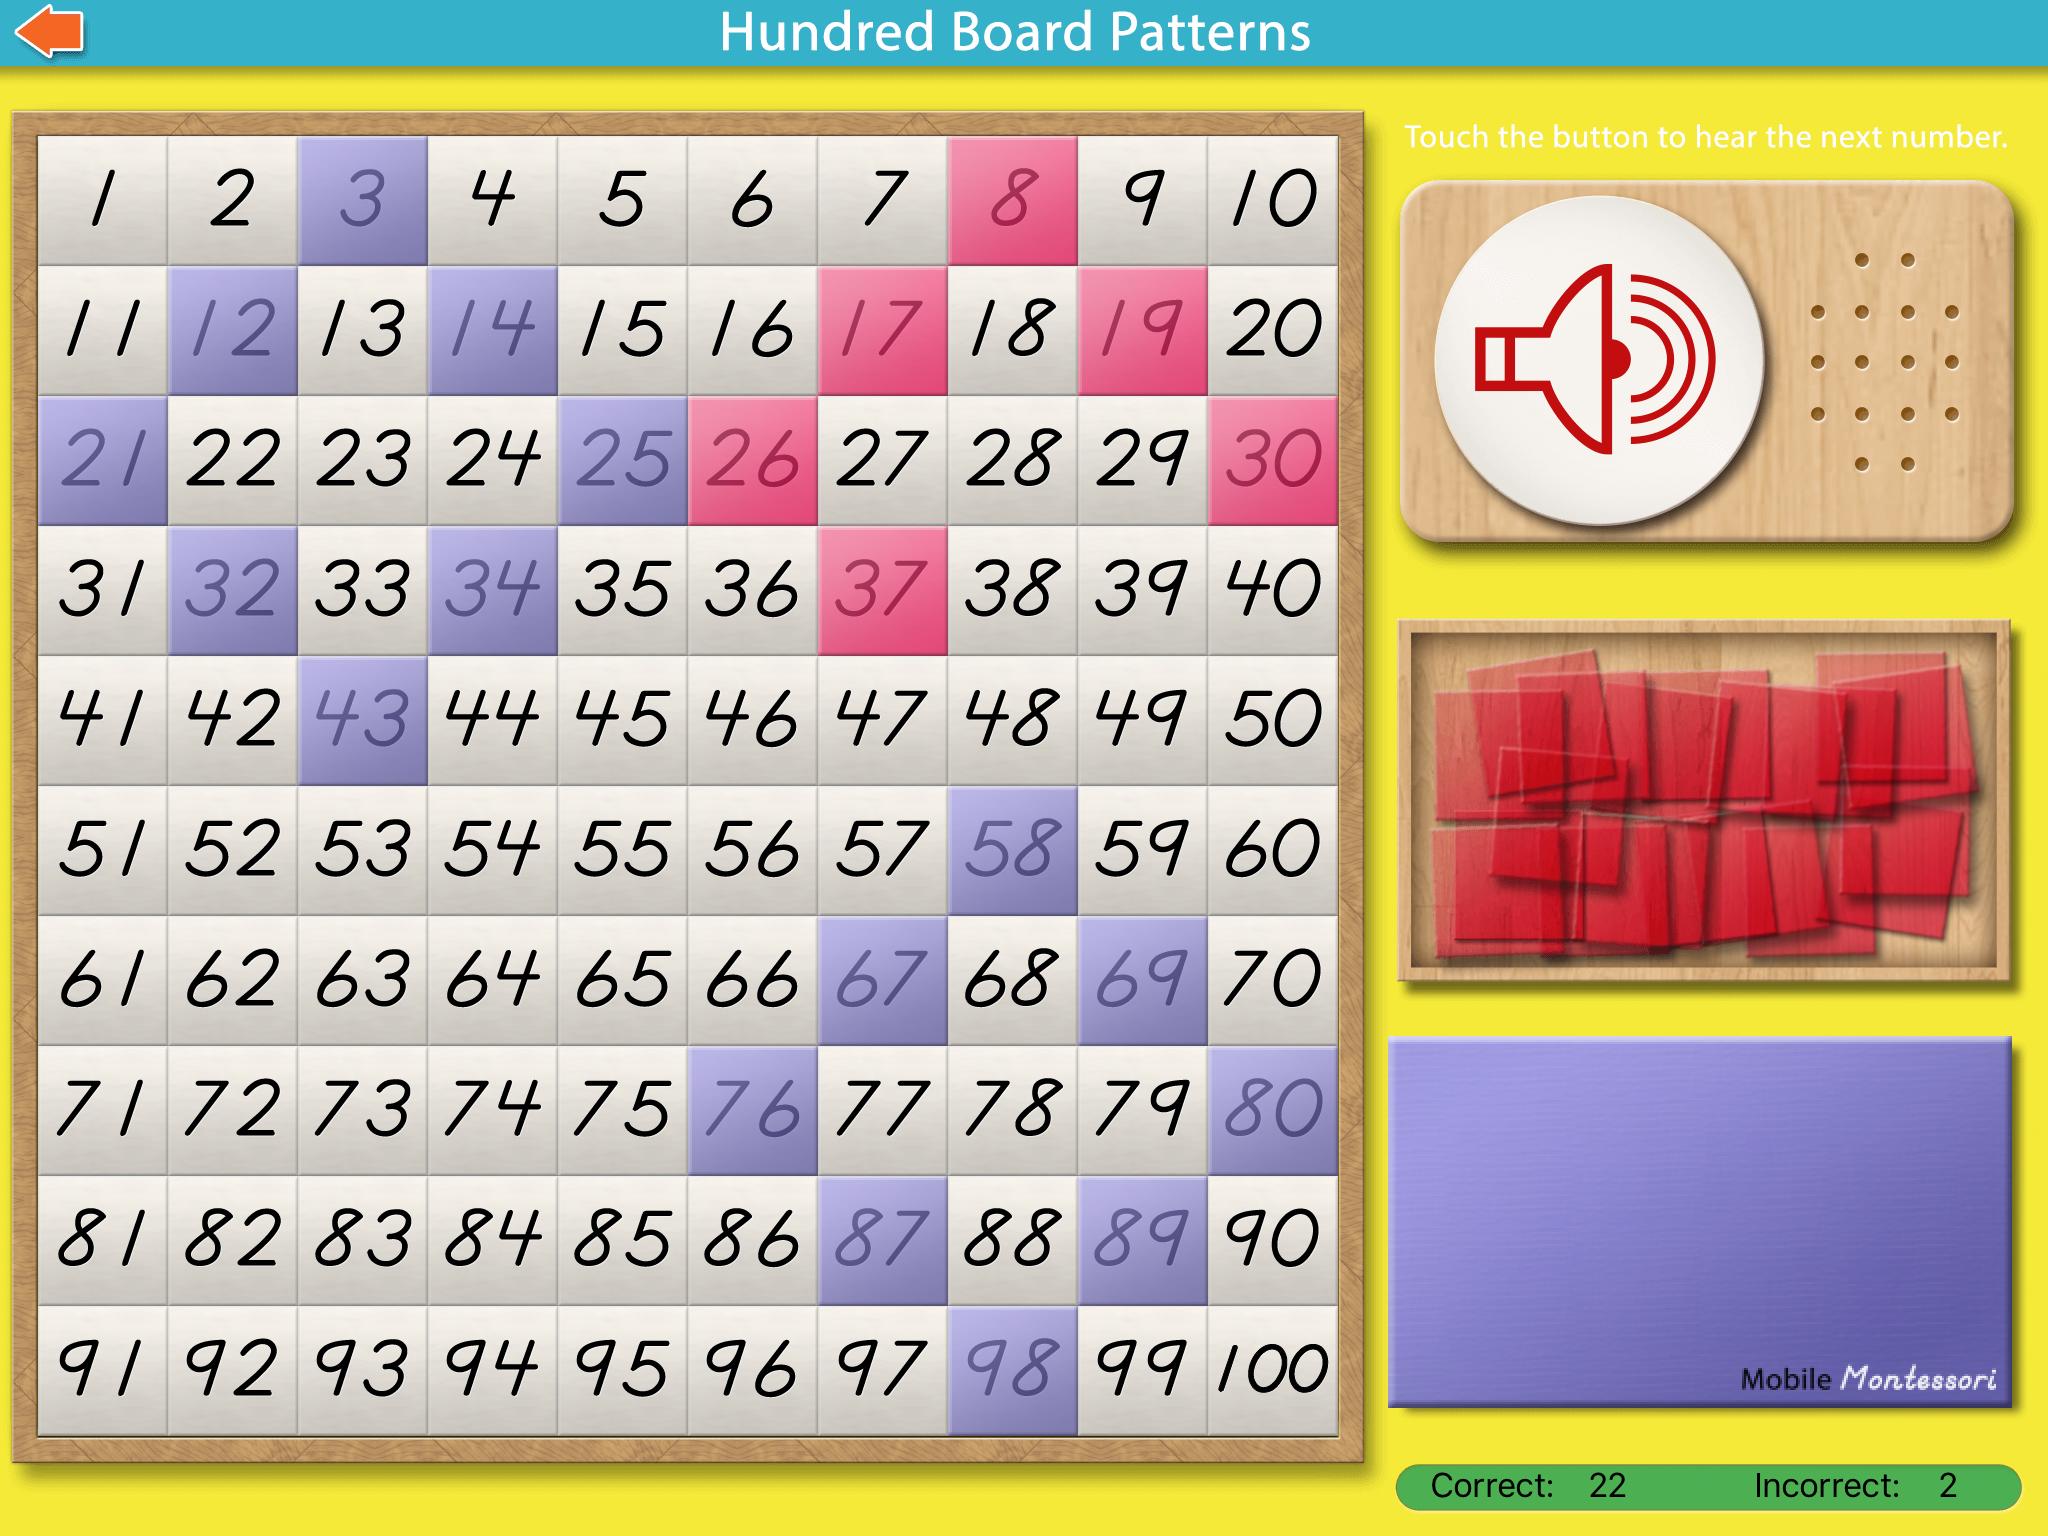 HundredBoardPatternsSC4-reg.png